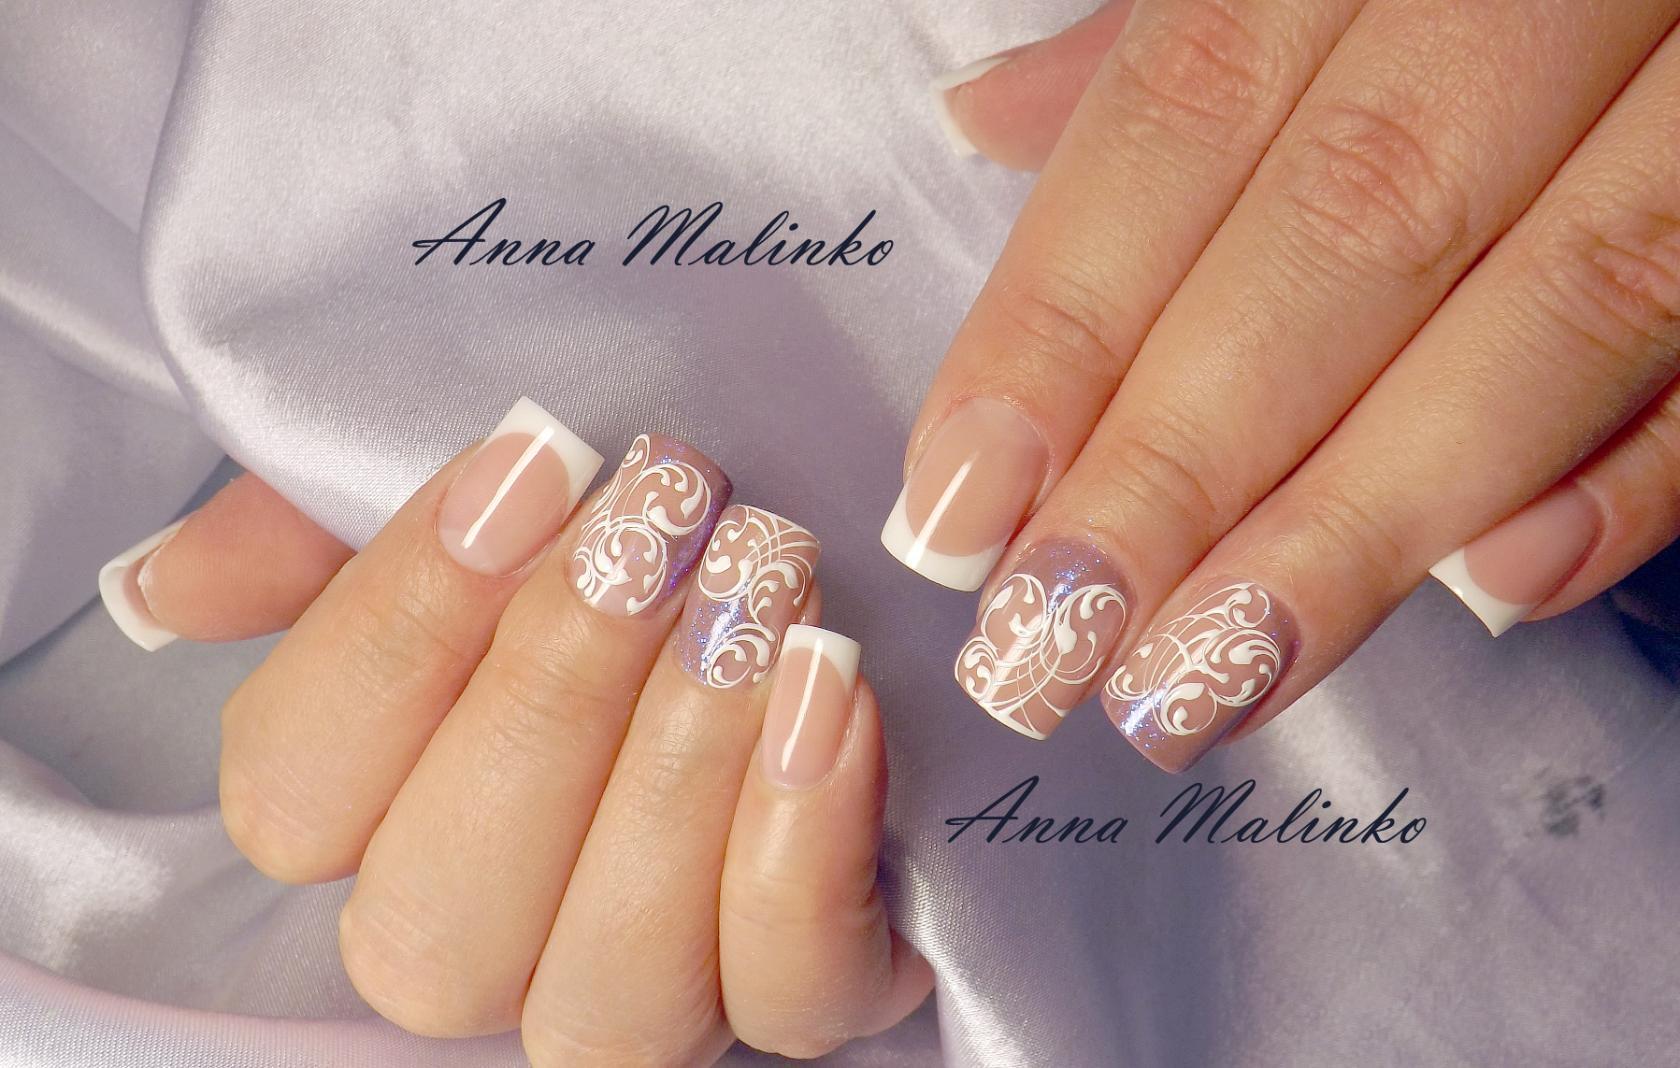 Анна малинко ногти фото